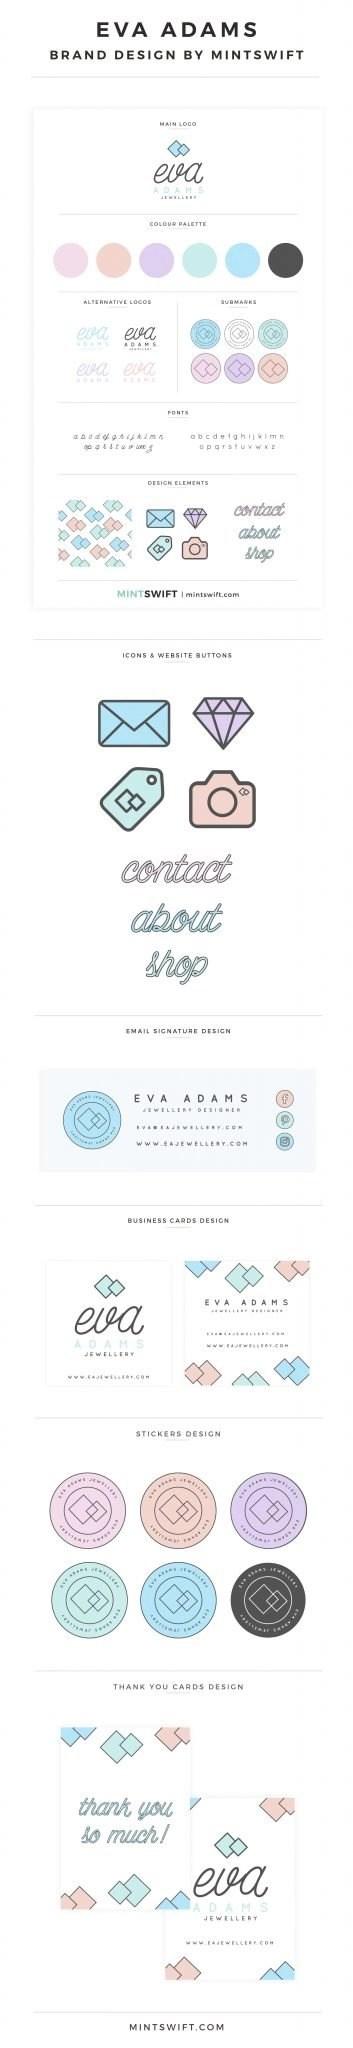 Eva Adams - Brand Design by MintSwift